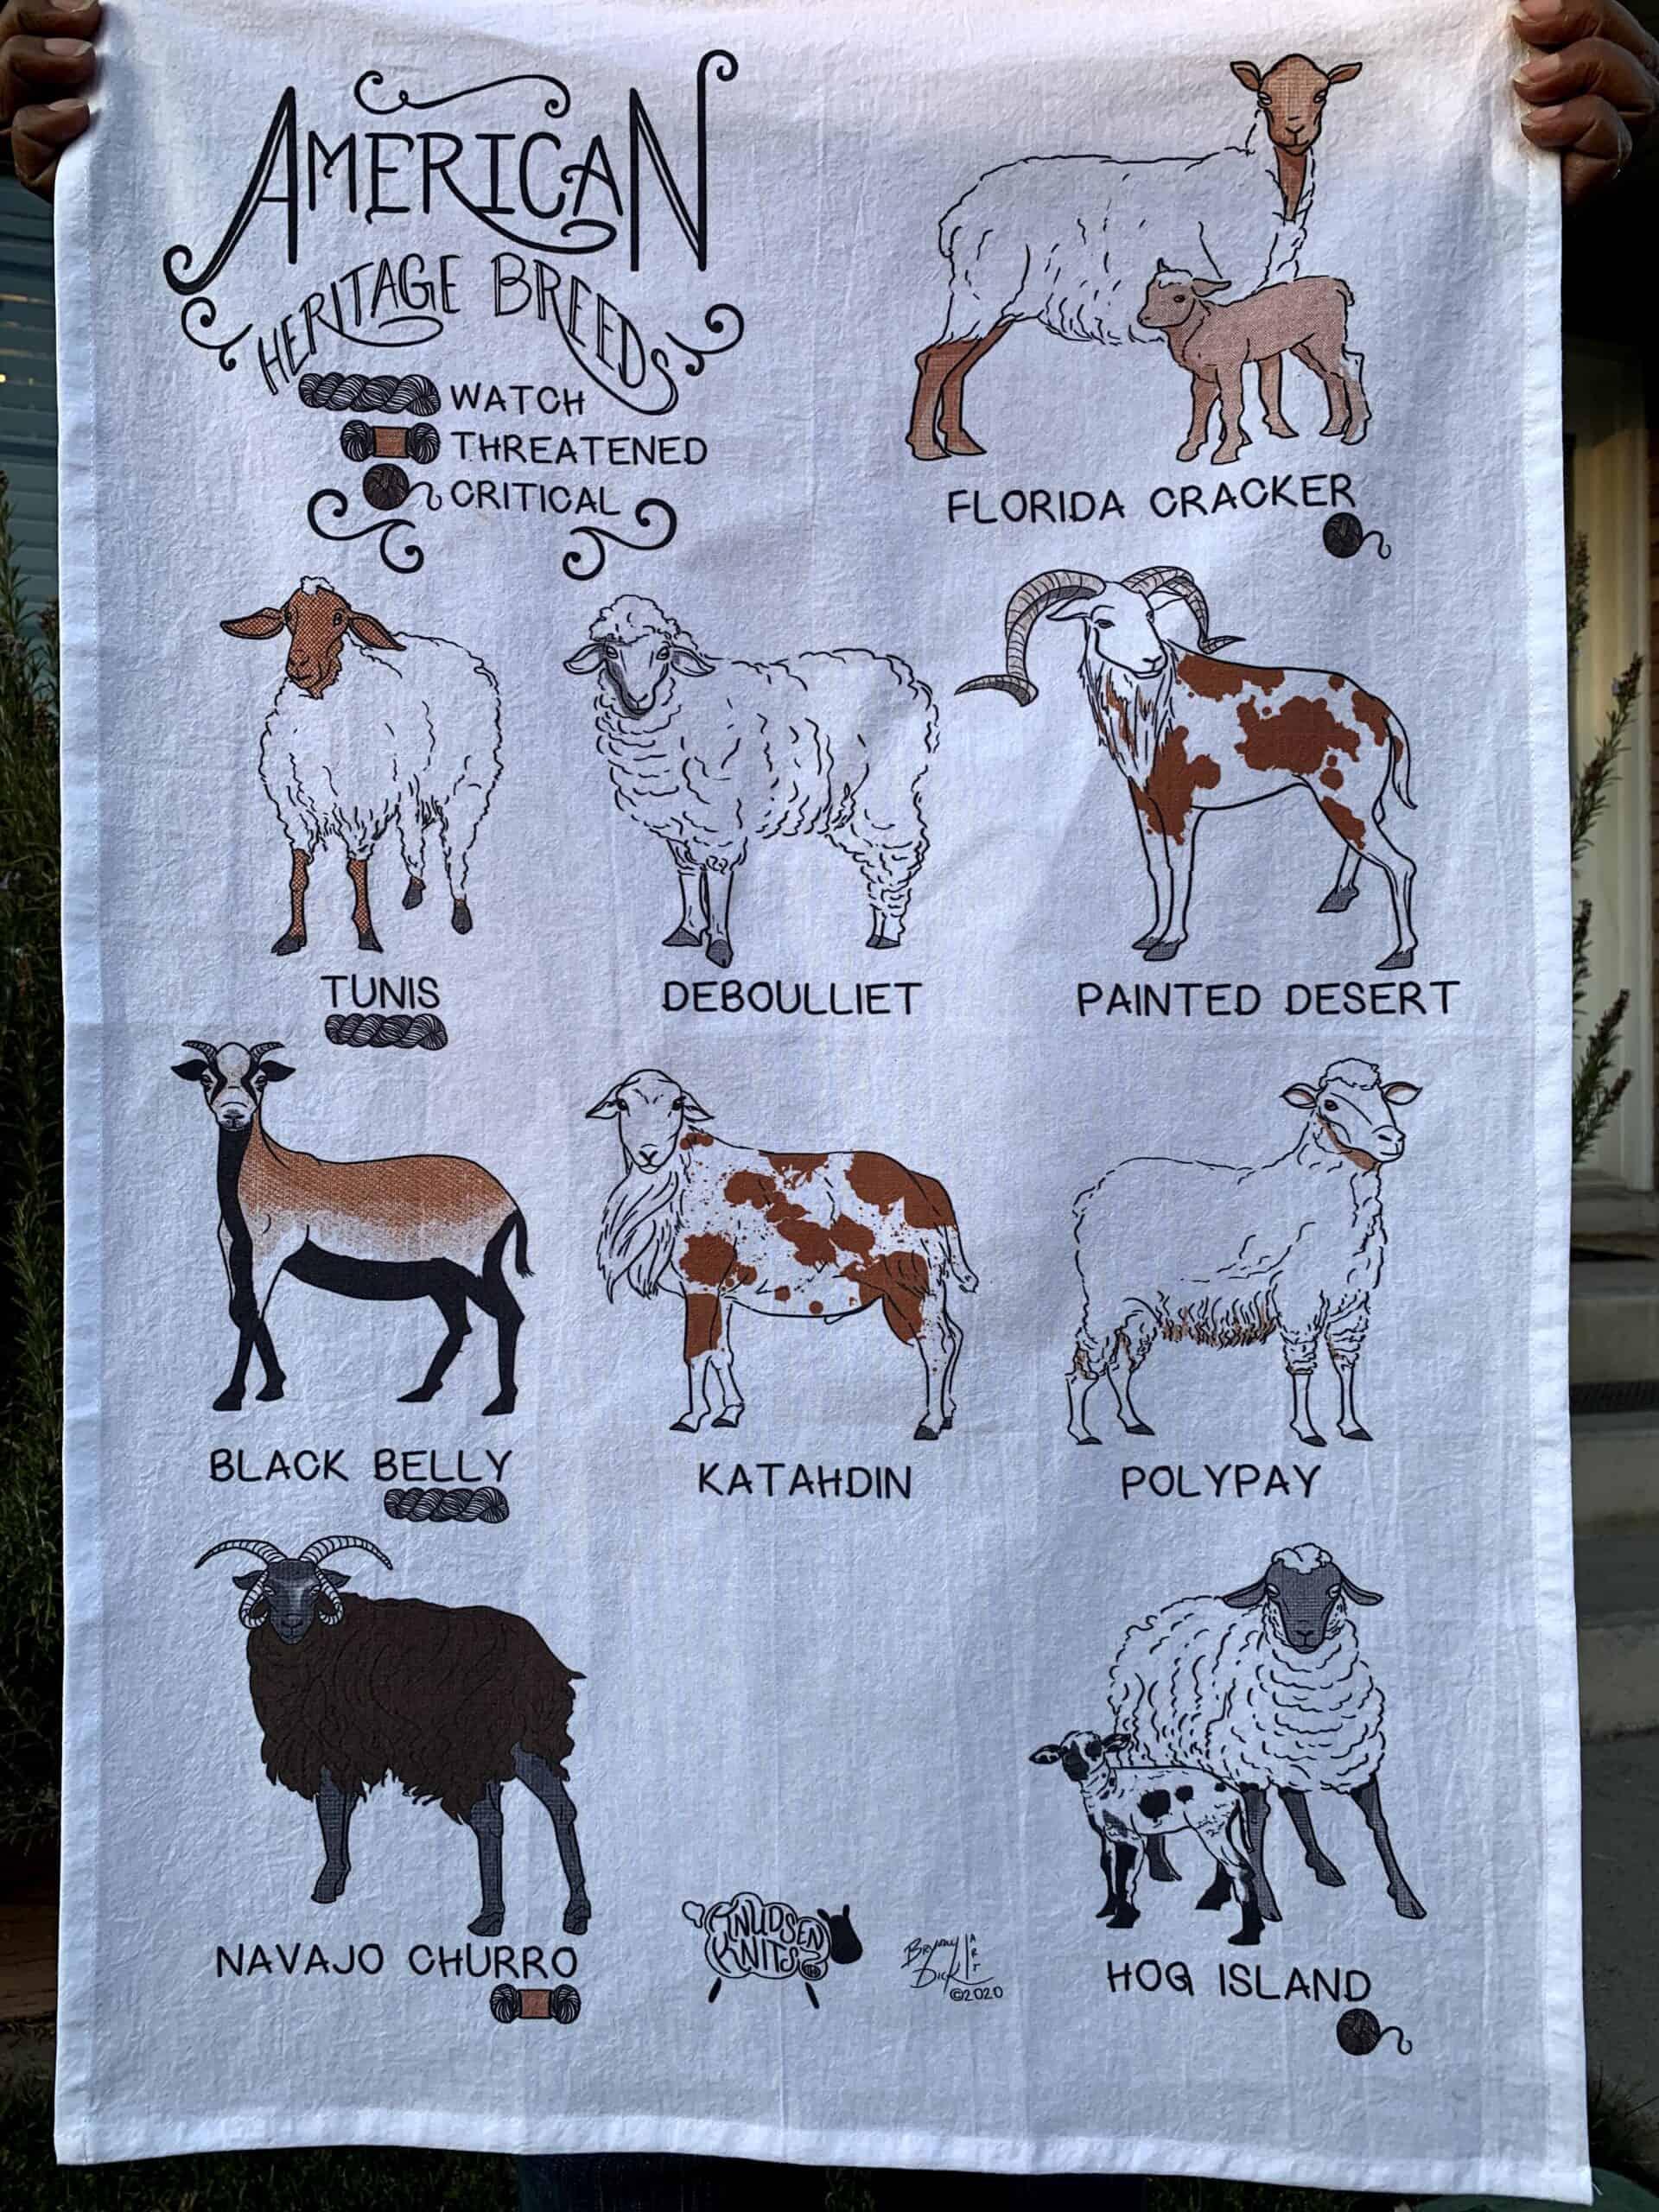 American Sheep Breeds Tea Towel